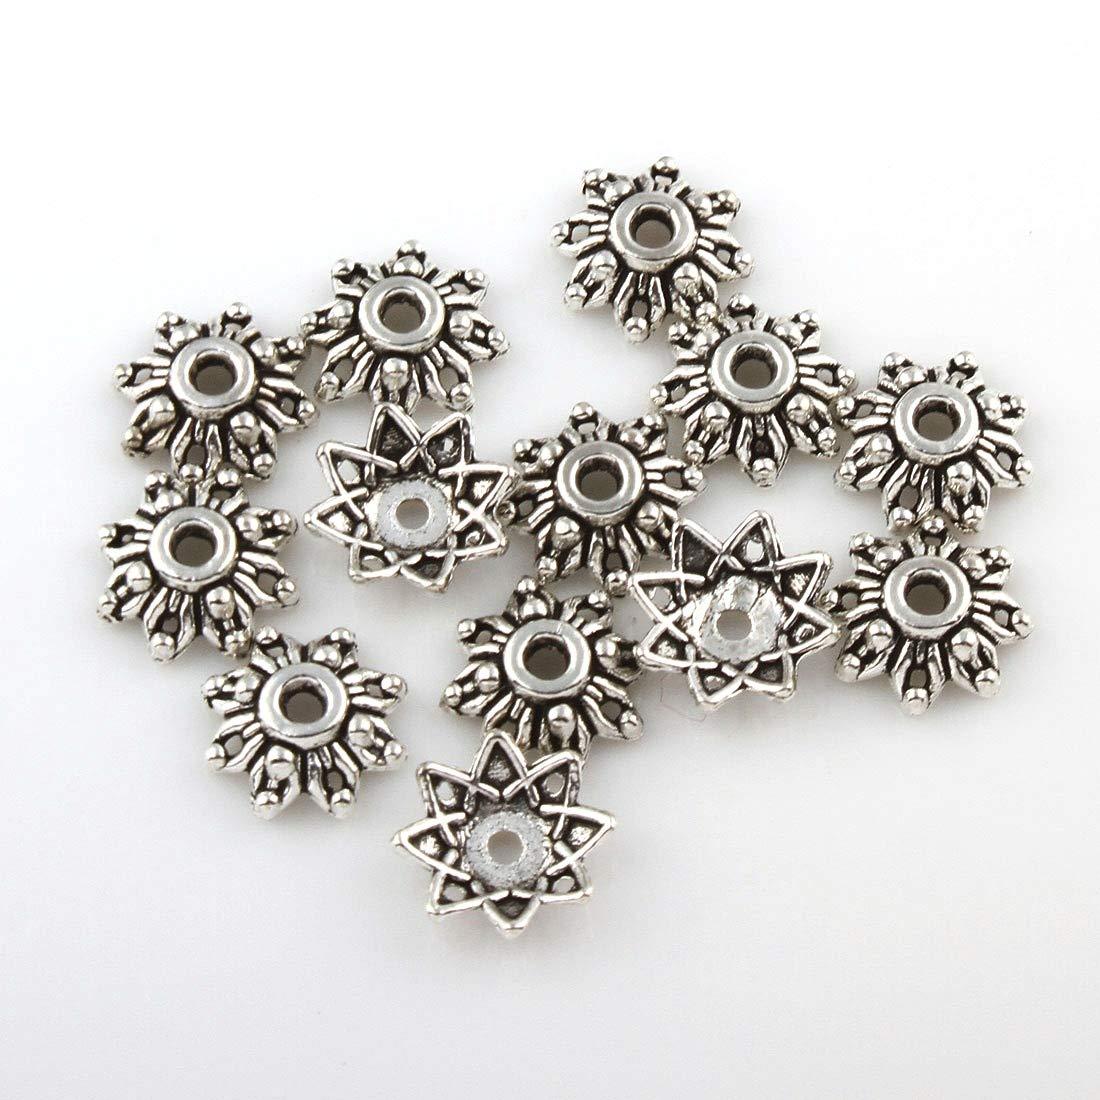 50 Metallperlen Spacer 8mm Tibet silber Zwischenteile Perlenkappen M232